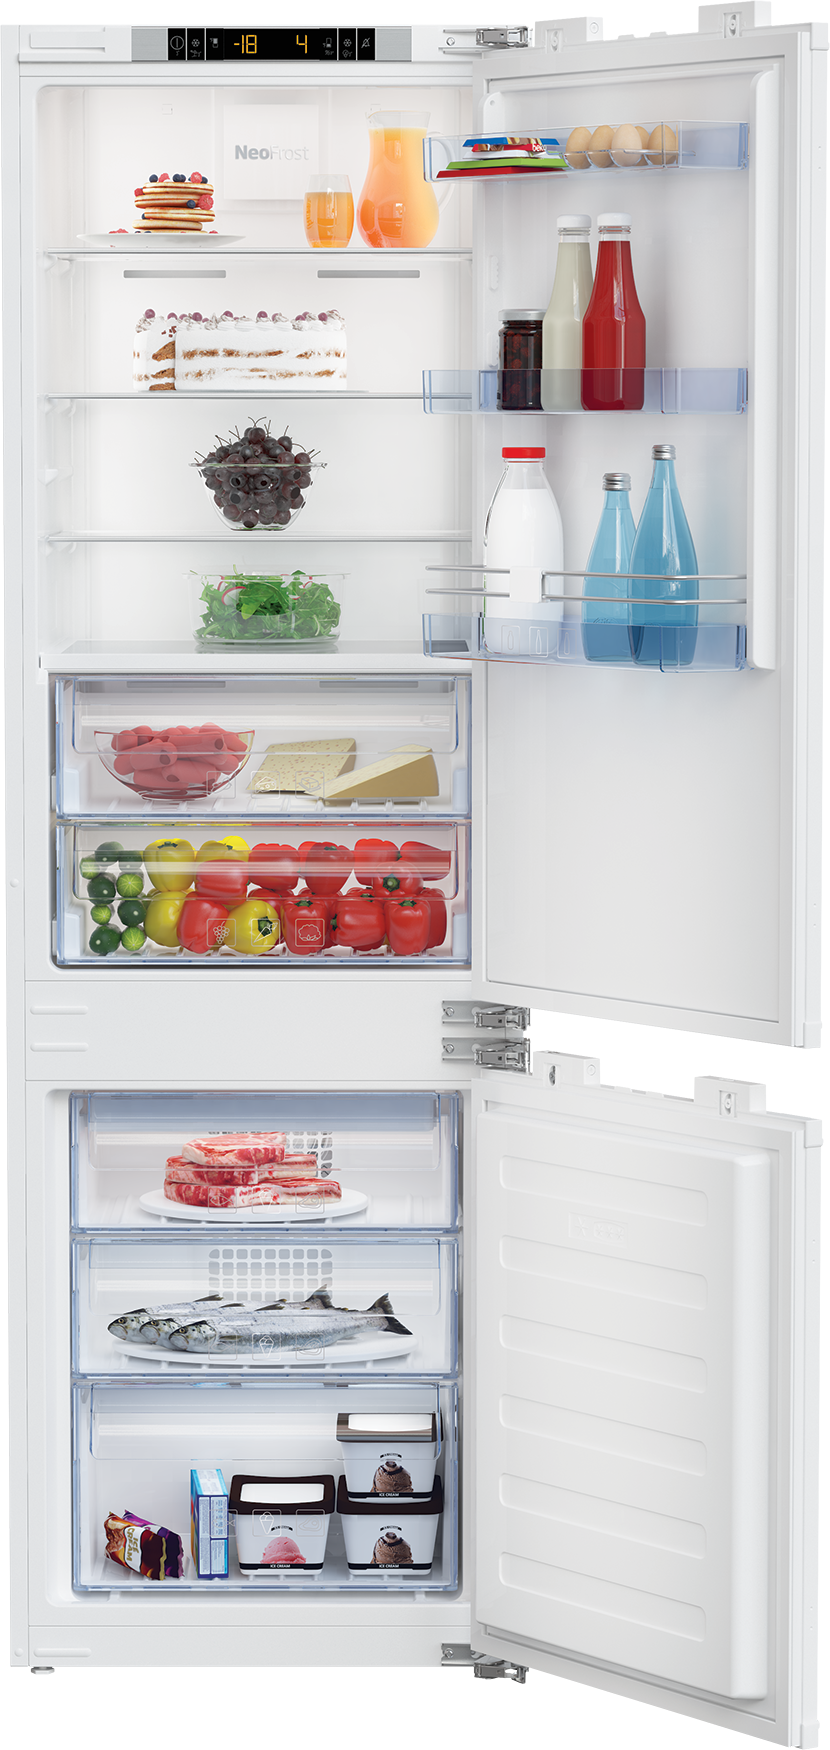 Beko 22 Inch 22 Built In Bottom Freezer Refrigerator Panel Ready Bbbf2410 In 2020 Refrigerator Panels Bottom Freezer Refrigerator Cantilever Shelf